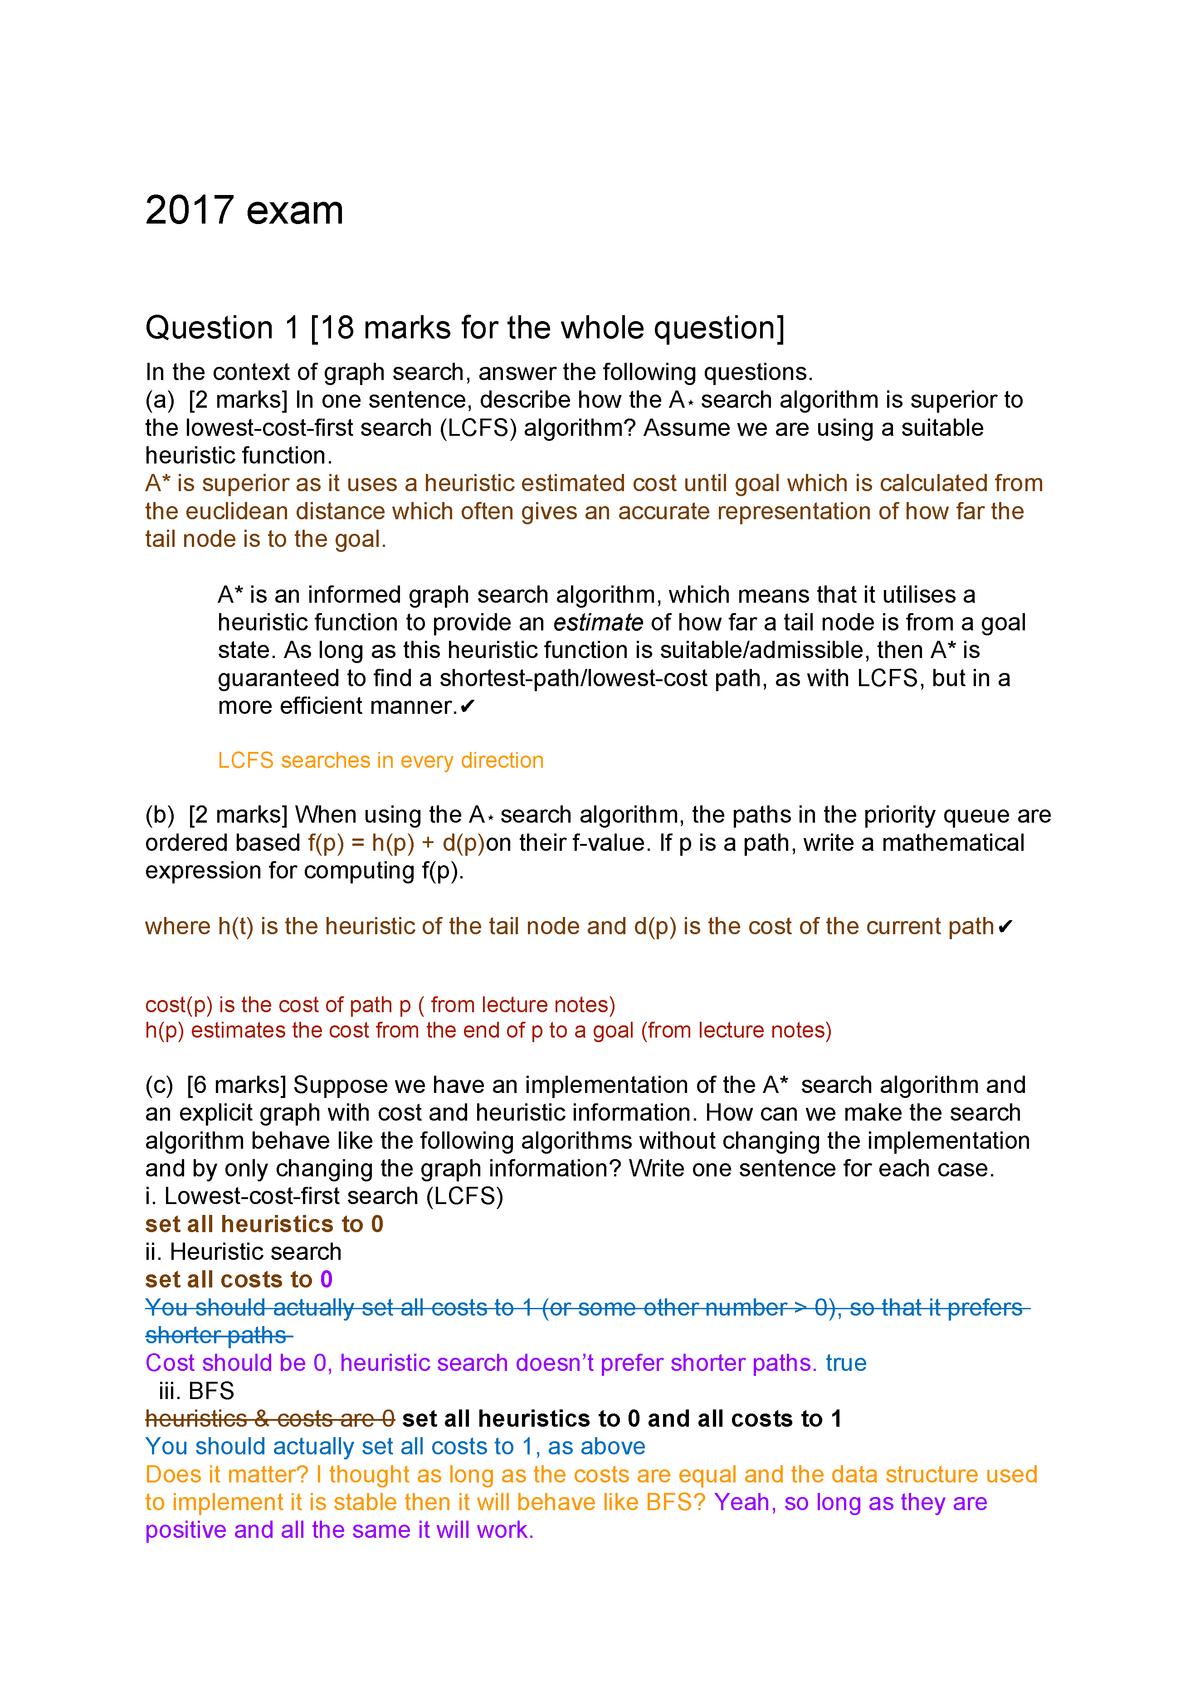 COSC 367 Exam 2017 - Artificial Intelligence COSC367 - StuDocu